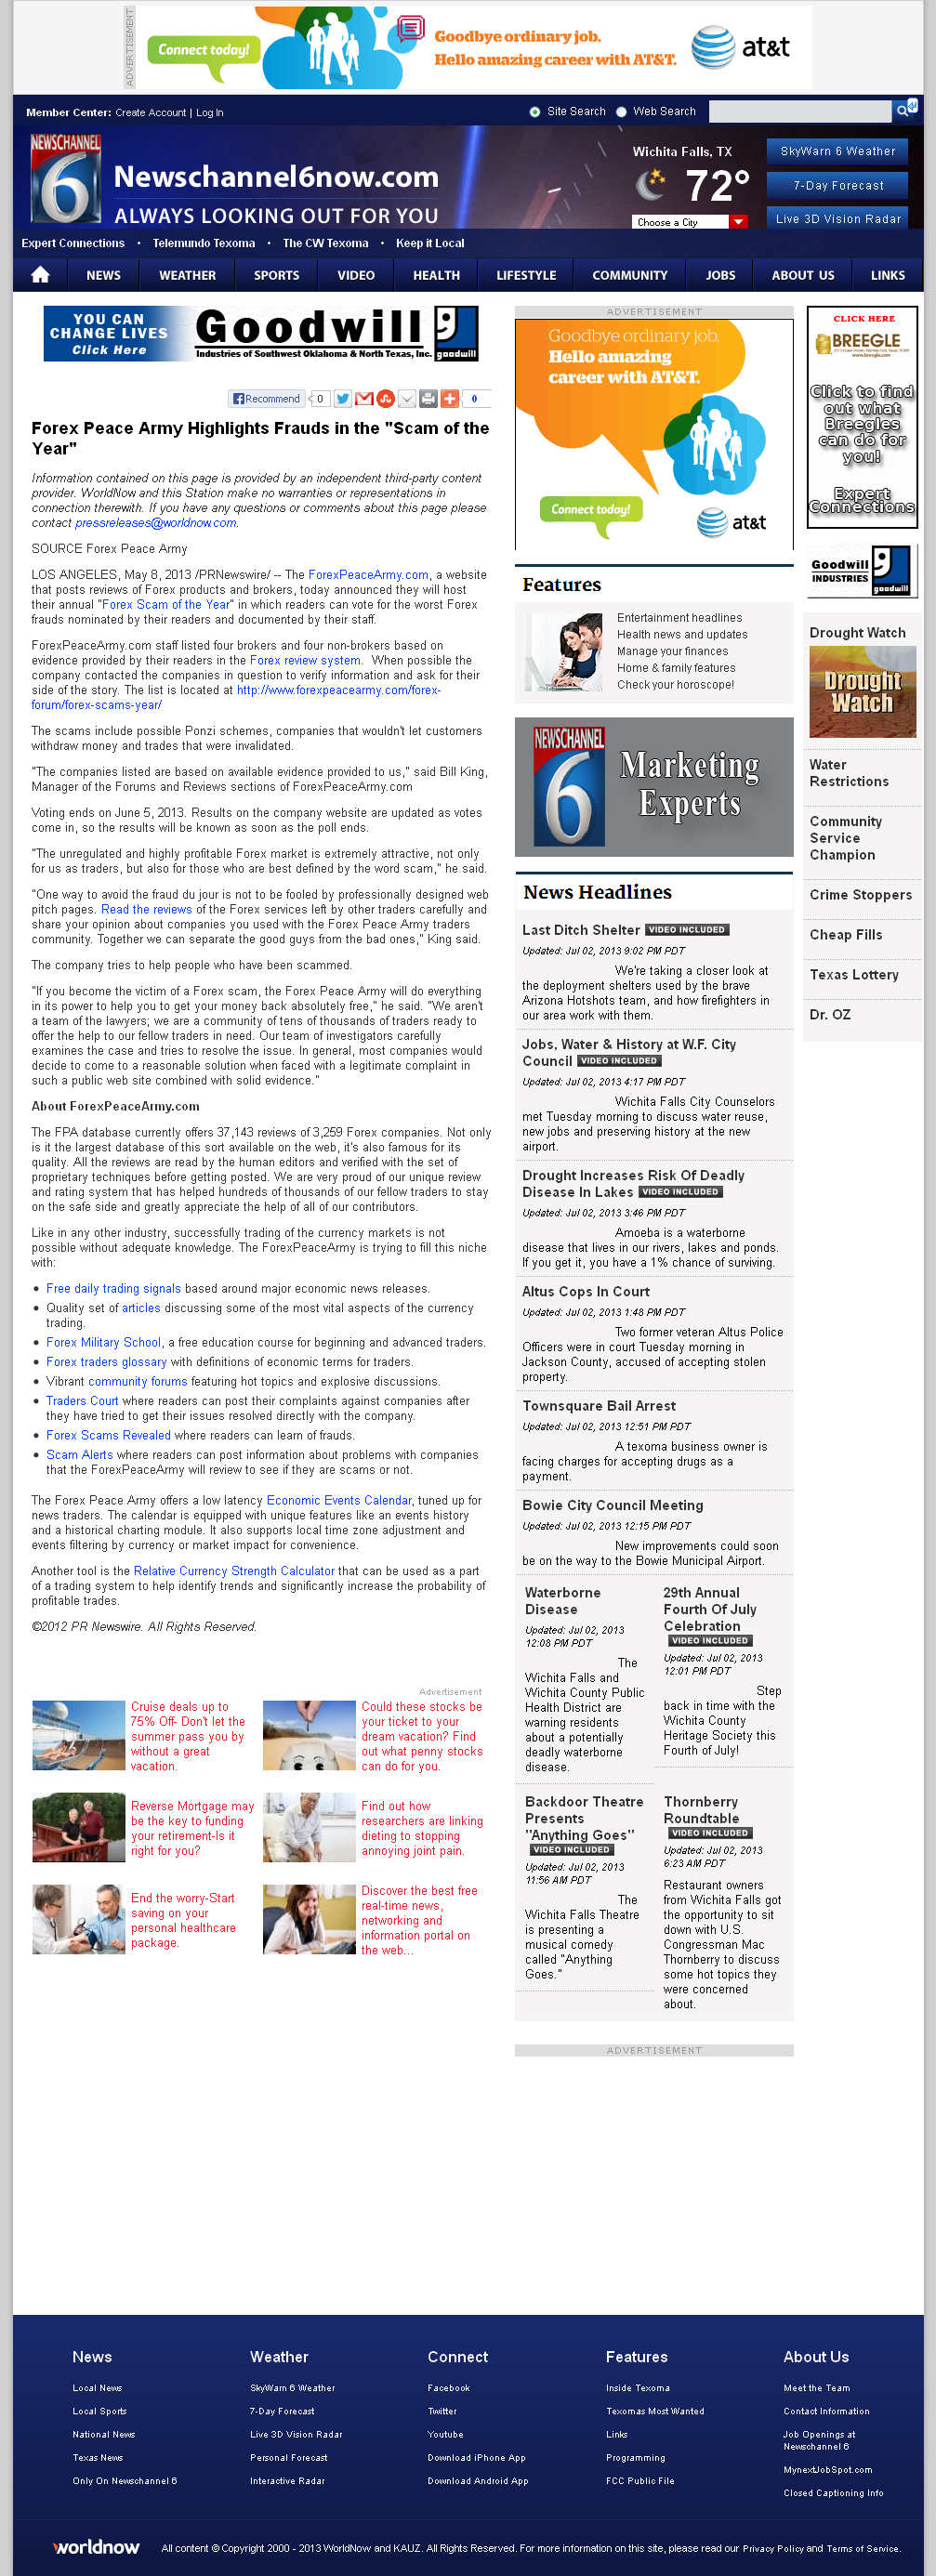 Forex Peace Army | KAUZ-TV CBS-6 (Wichita Falls, TX)